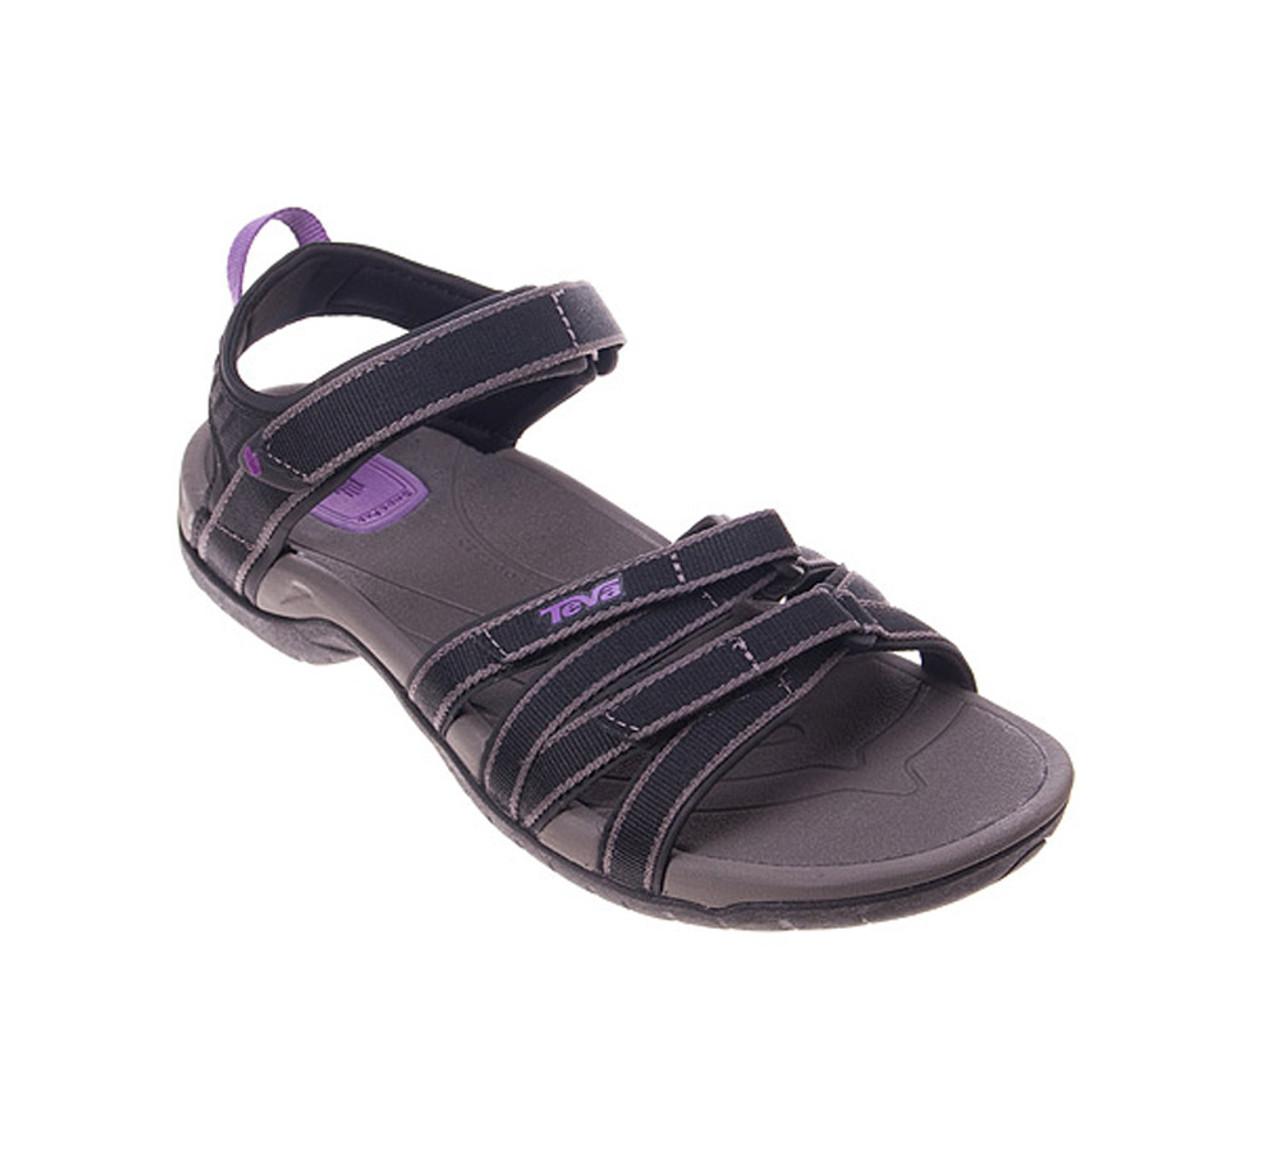 f499ca76bab8 Teva Women s Tirra Sandal Black Grey - Shop now   Shoolu.com